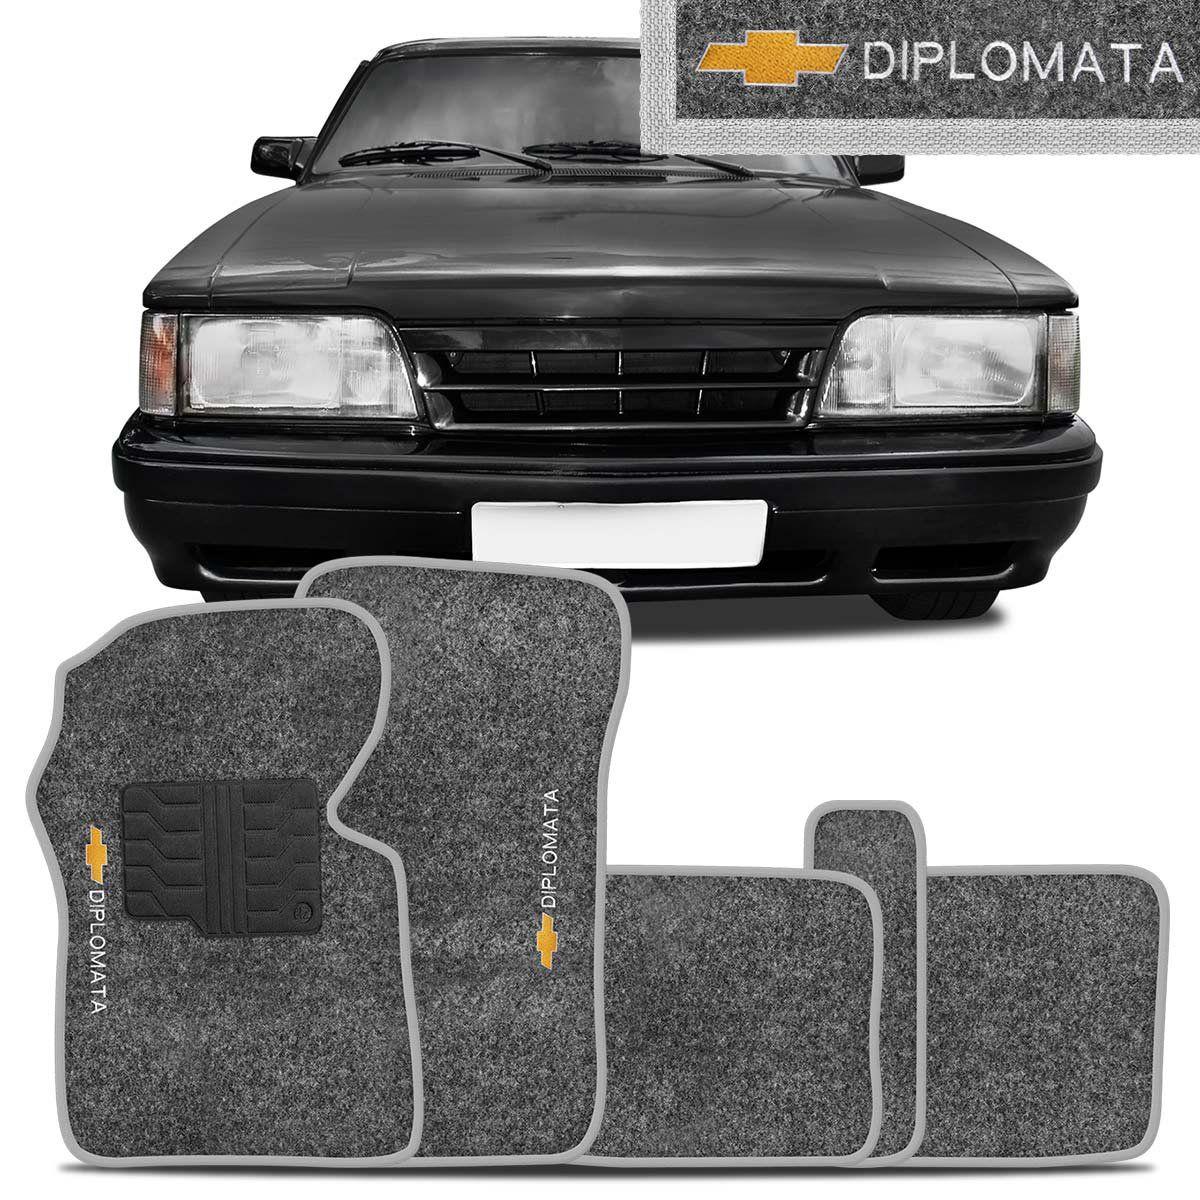 Tapete Carpete Opala Diplomata 80 81 82 83 84 85 86 87 88 89 90 91 92 Grafite